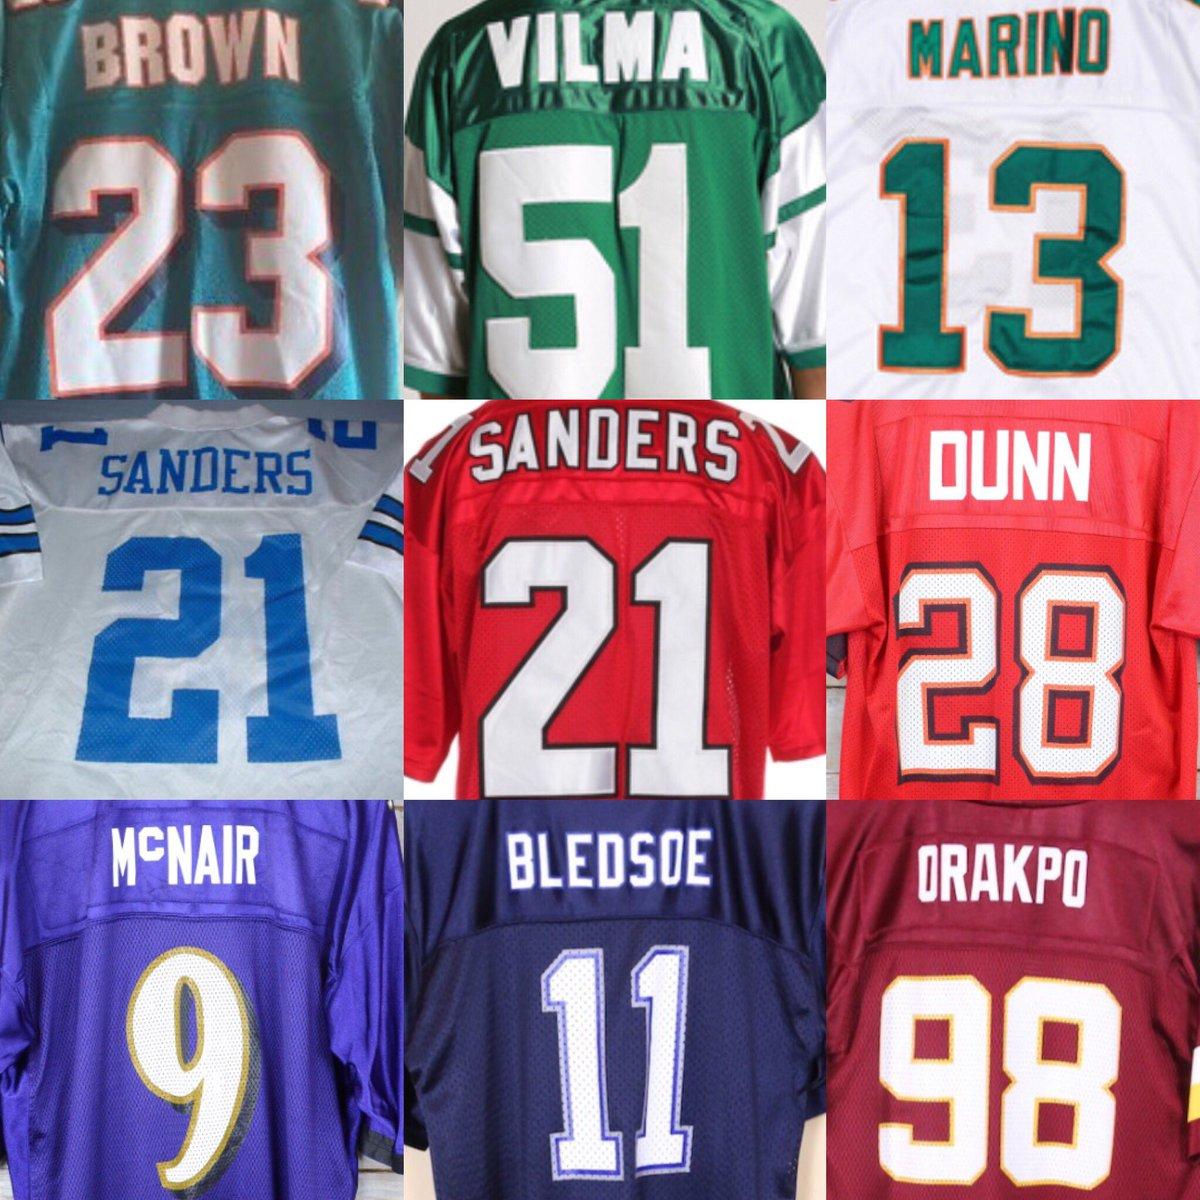 8fb5193cefe NFL Vintage UK🇬🇧 on Twitter: